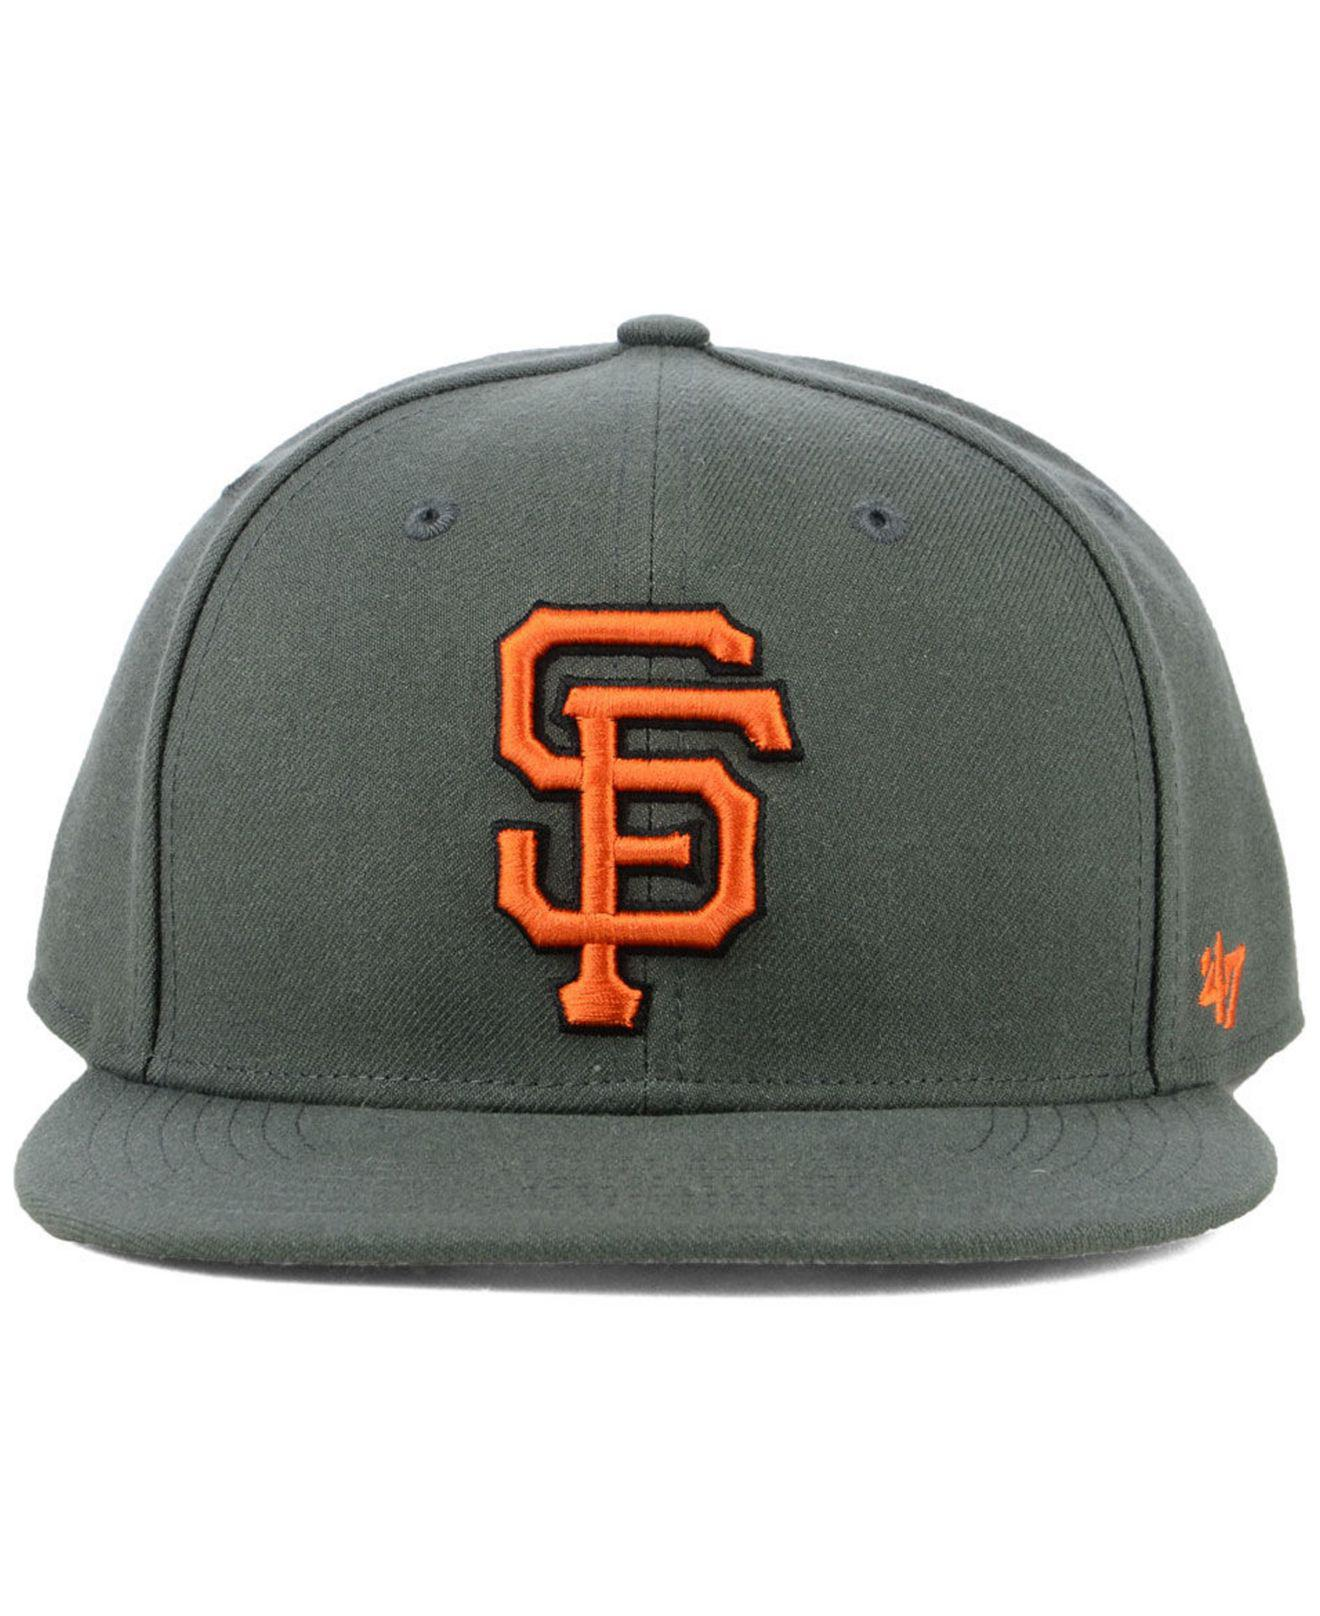 c4bbf5ea98d Lyst - 47 Brand San Francisco Giants Autumn Snapback Cap for Men